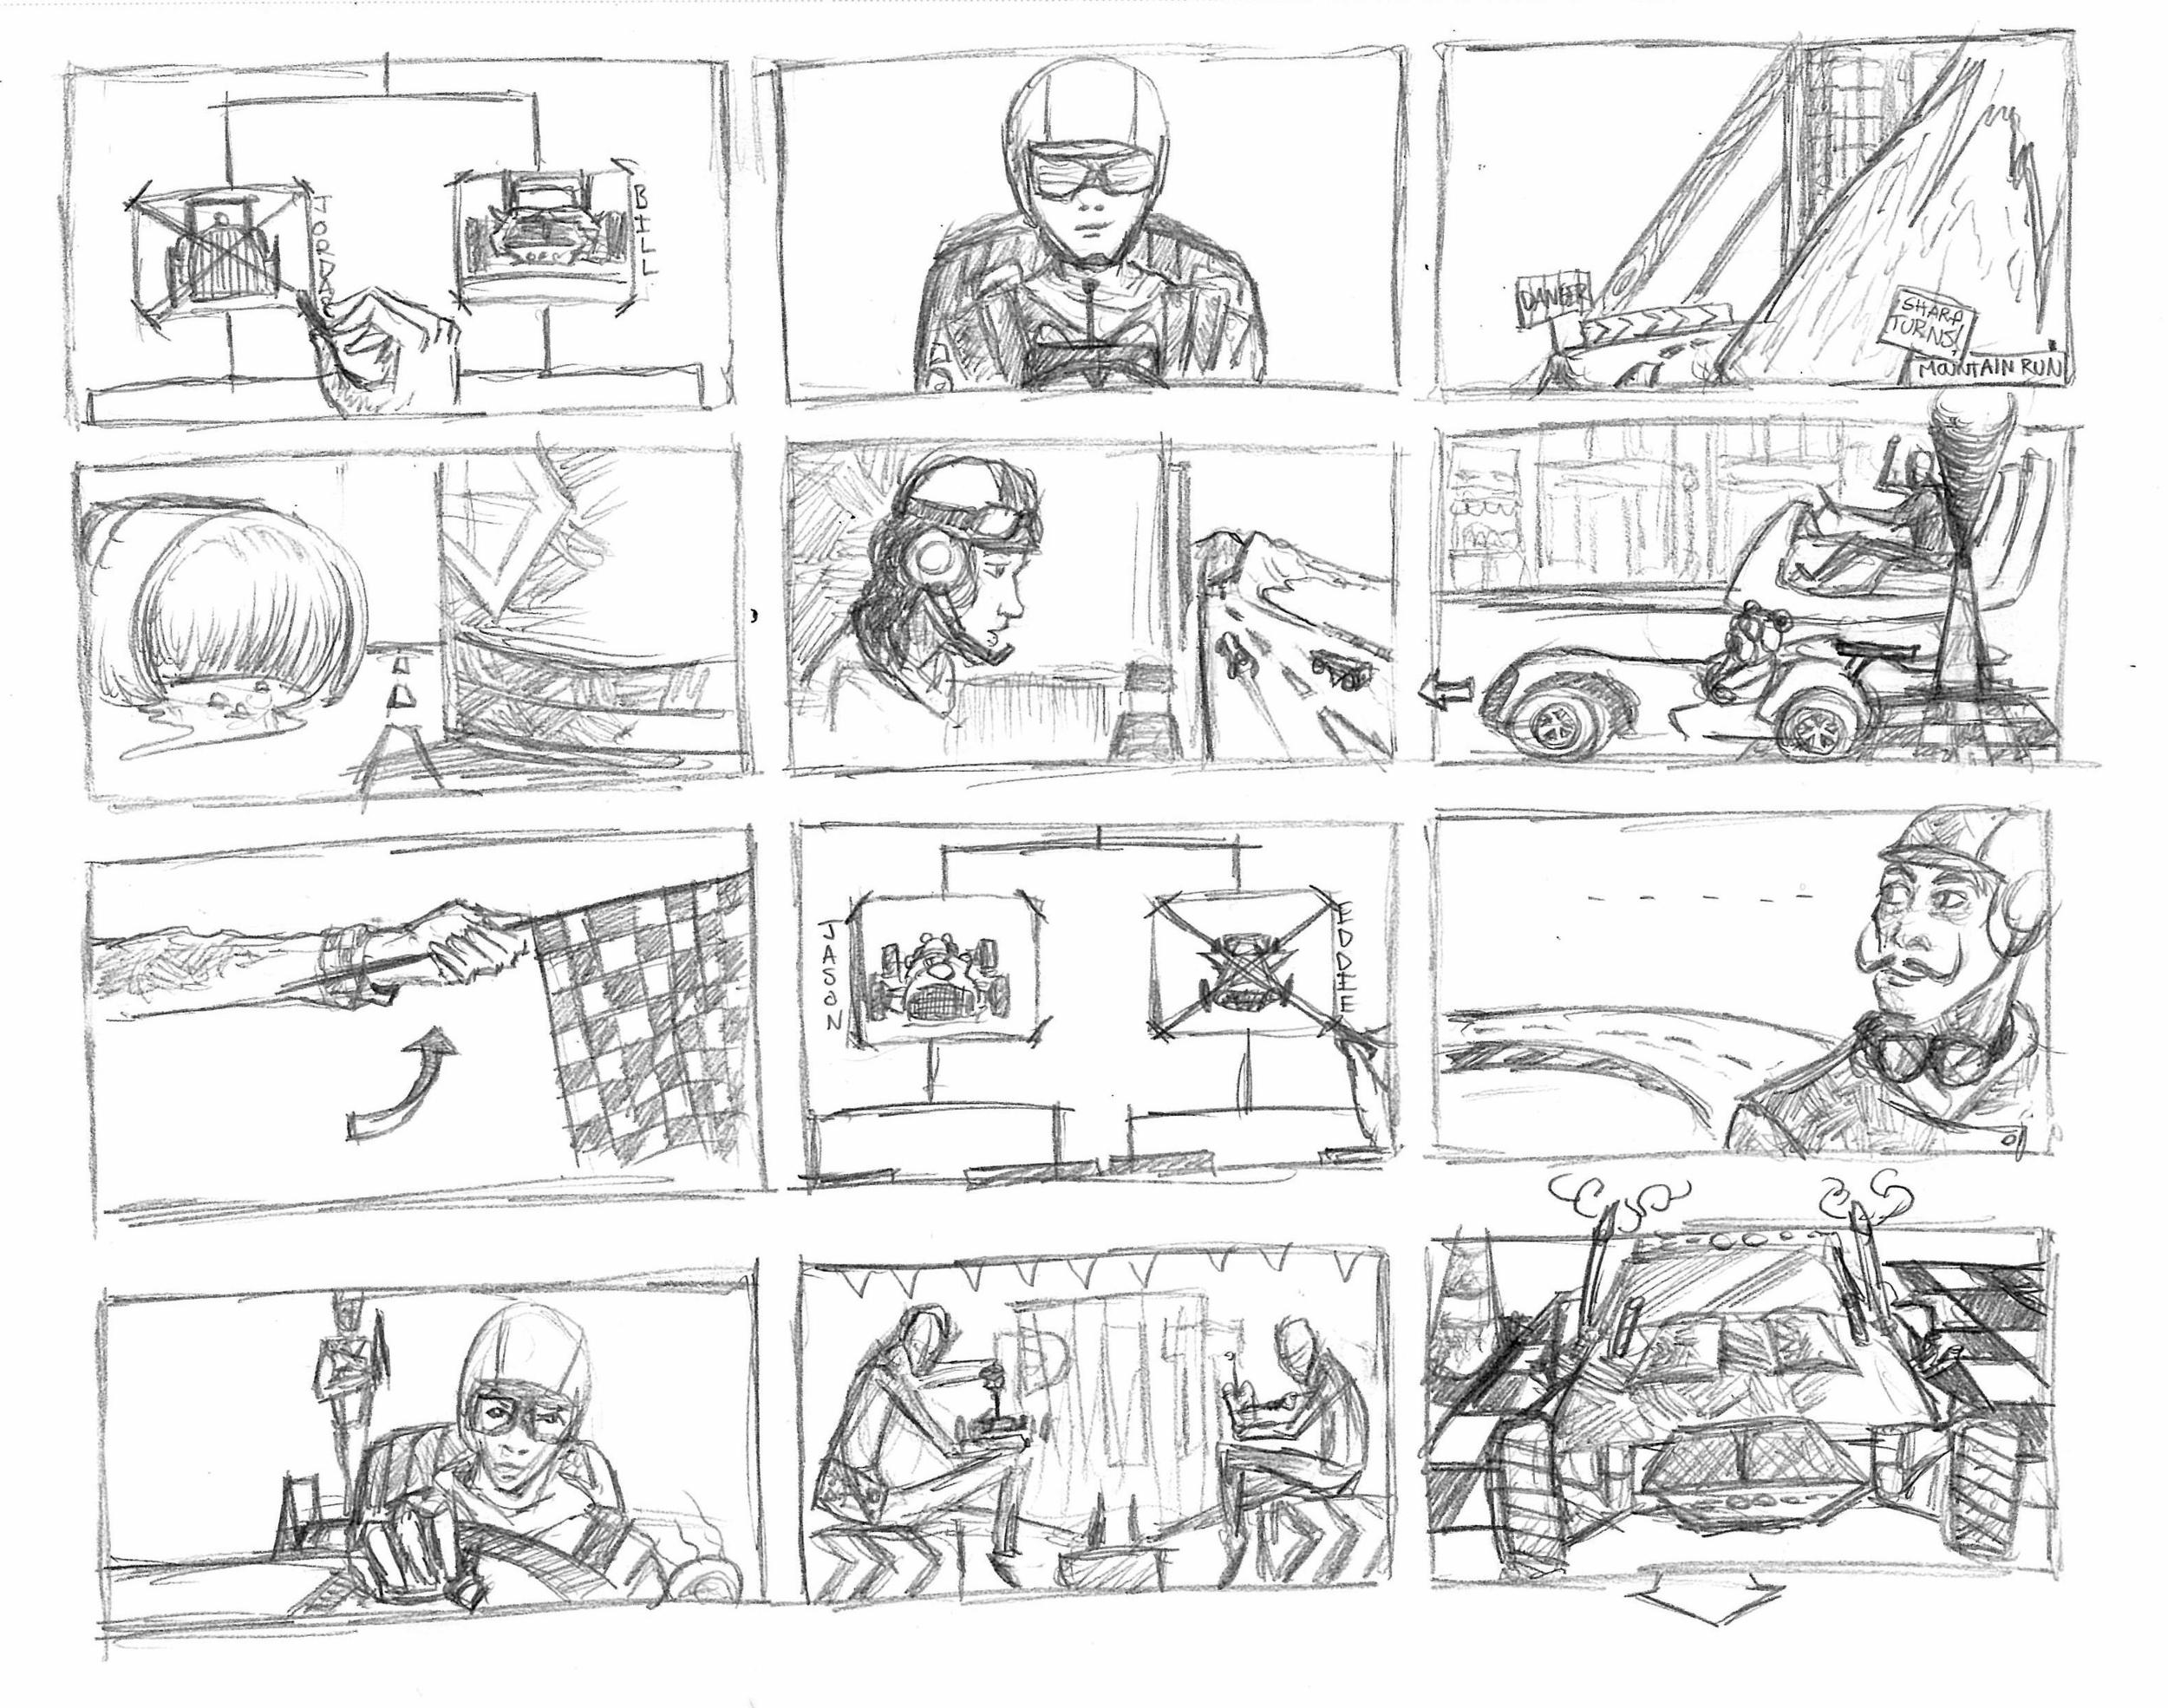 Prix Storyboard_PG009 - Film and TV - Jonathan B Perez - cREAtive Castle Studios.jpg